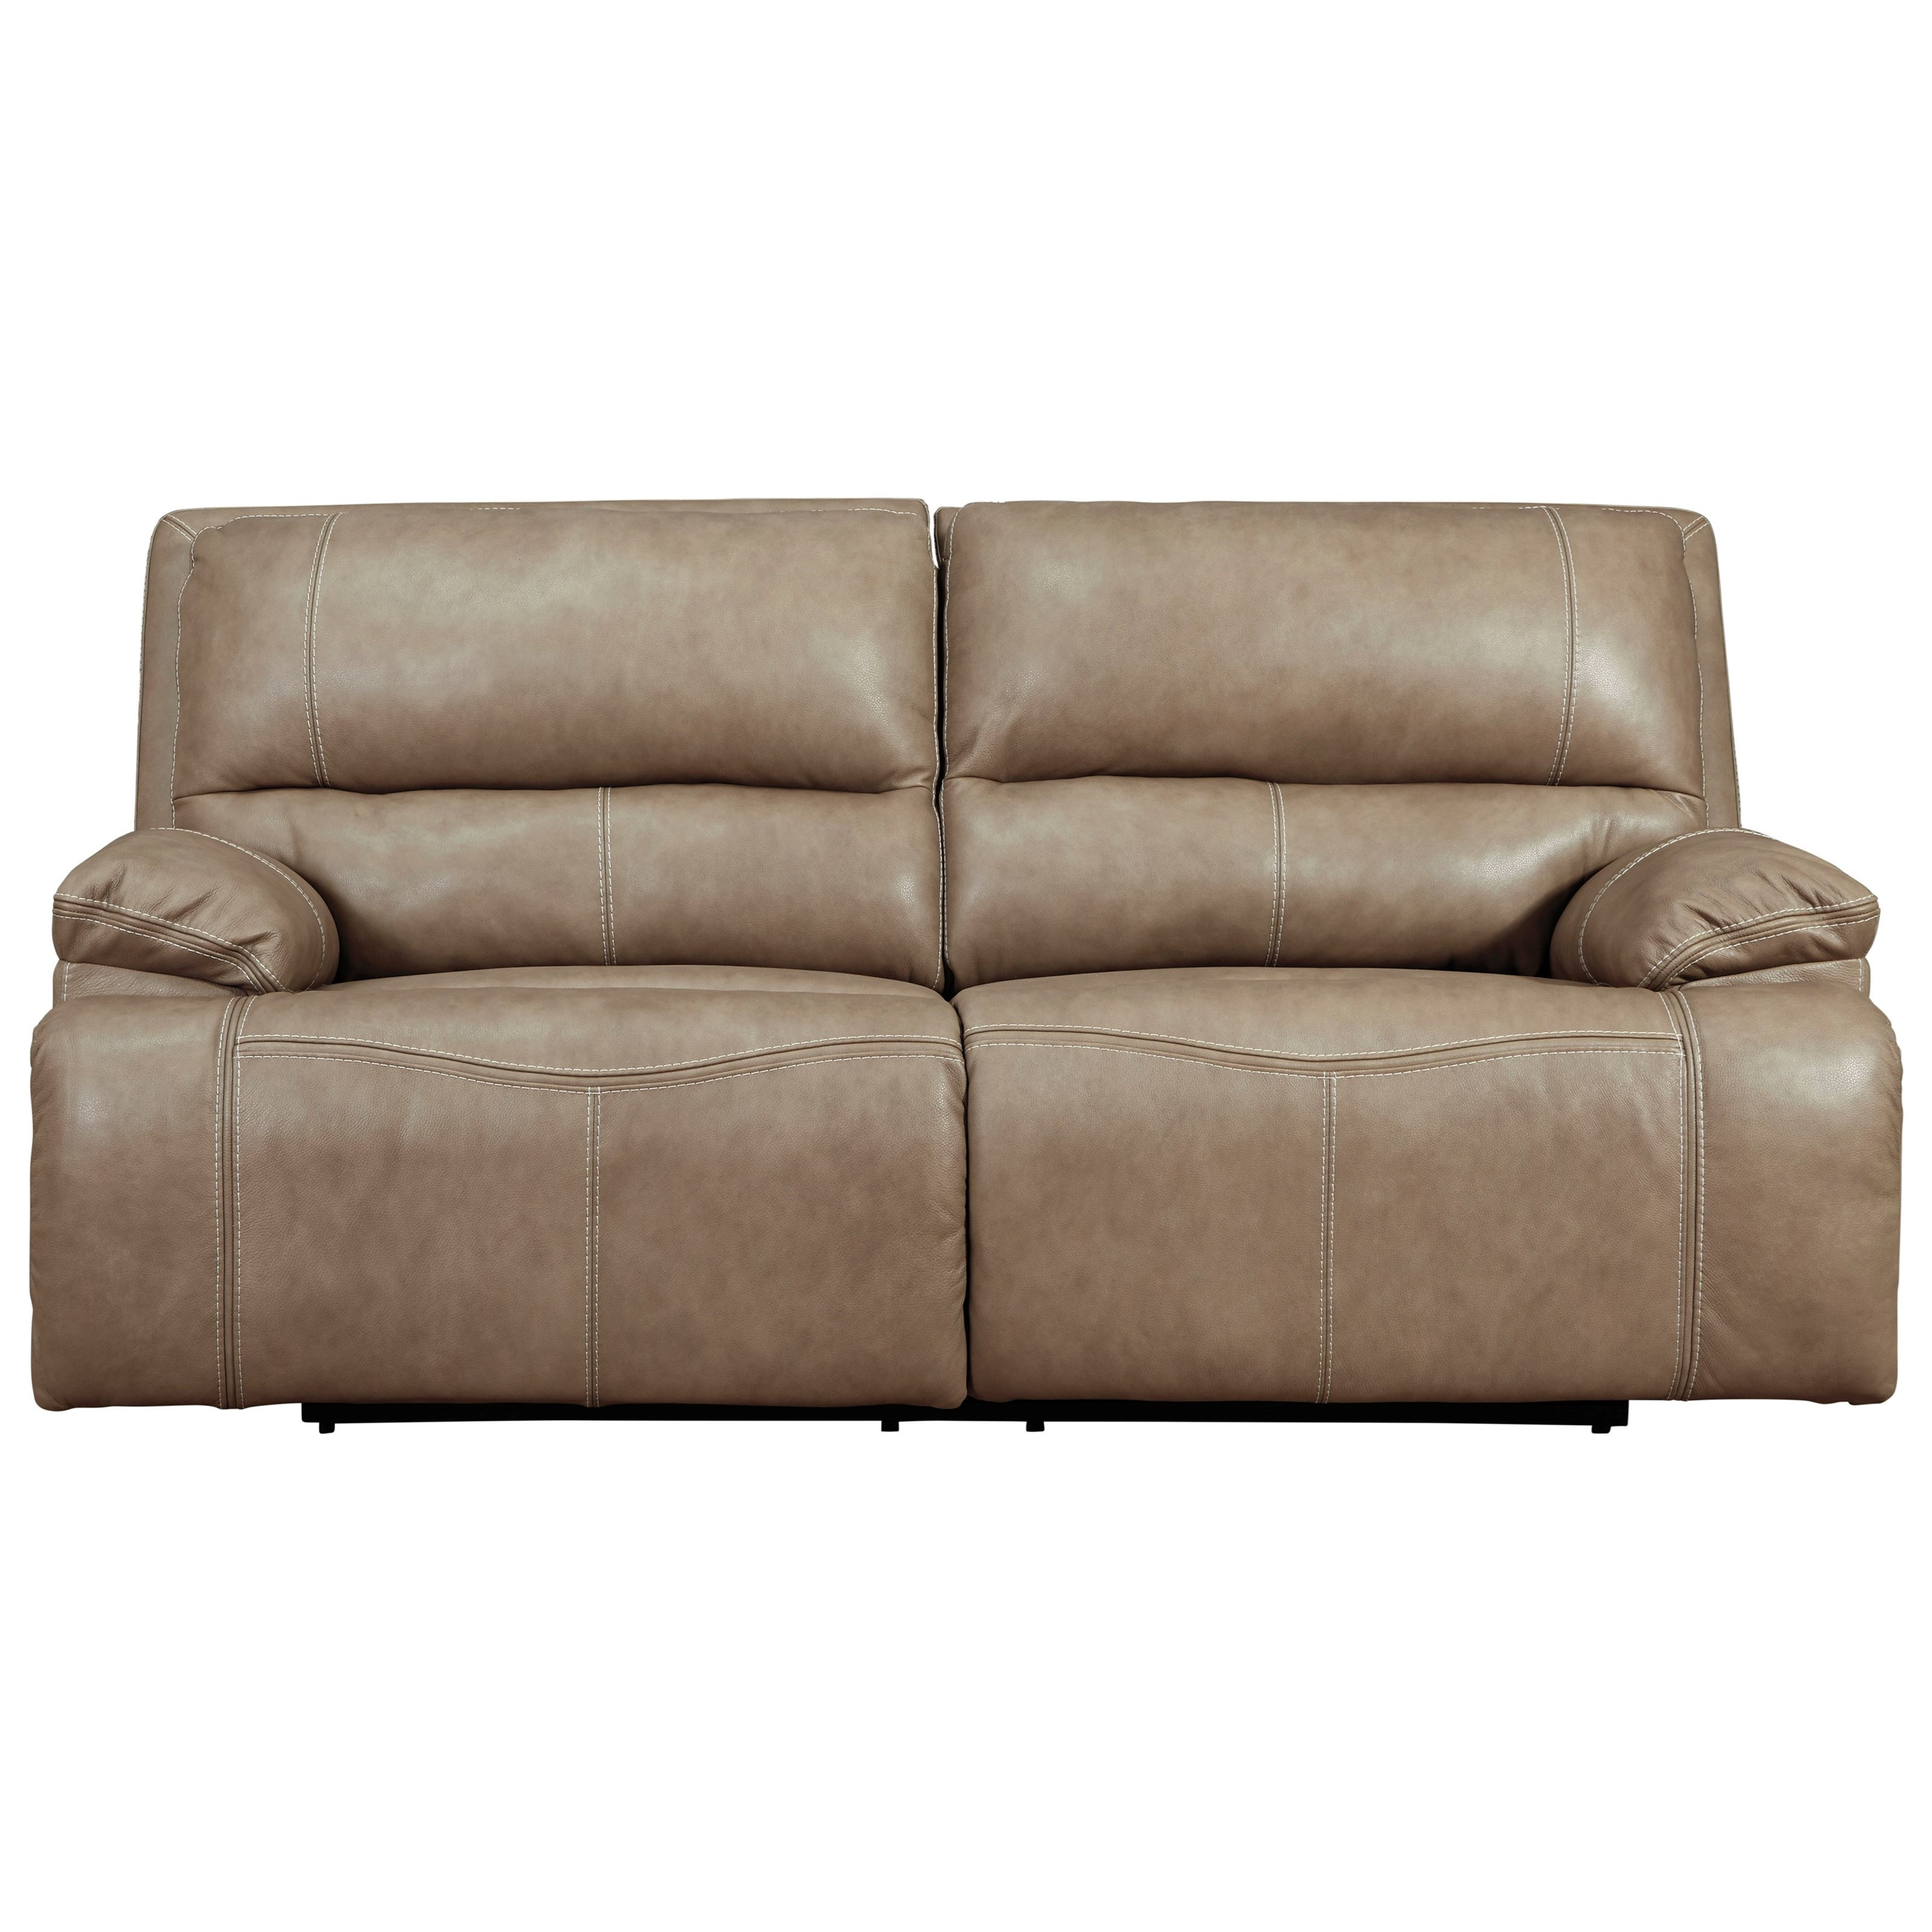 Signature Design by Ashley Ricmen Leather Match 2-Seat Power ...